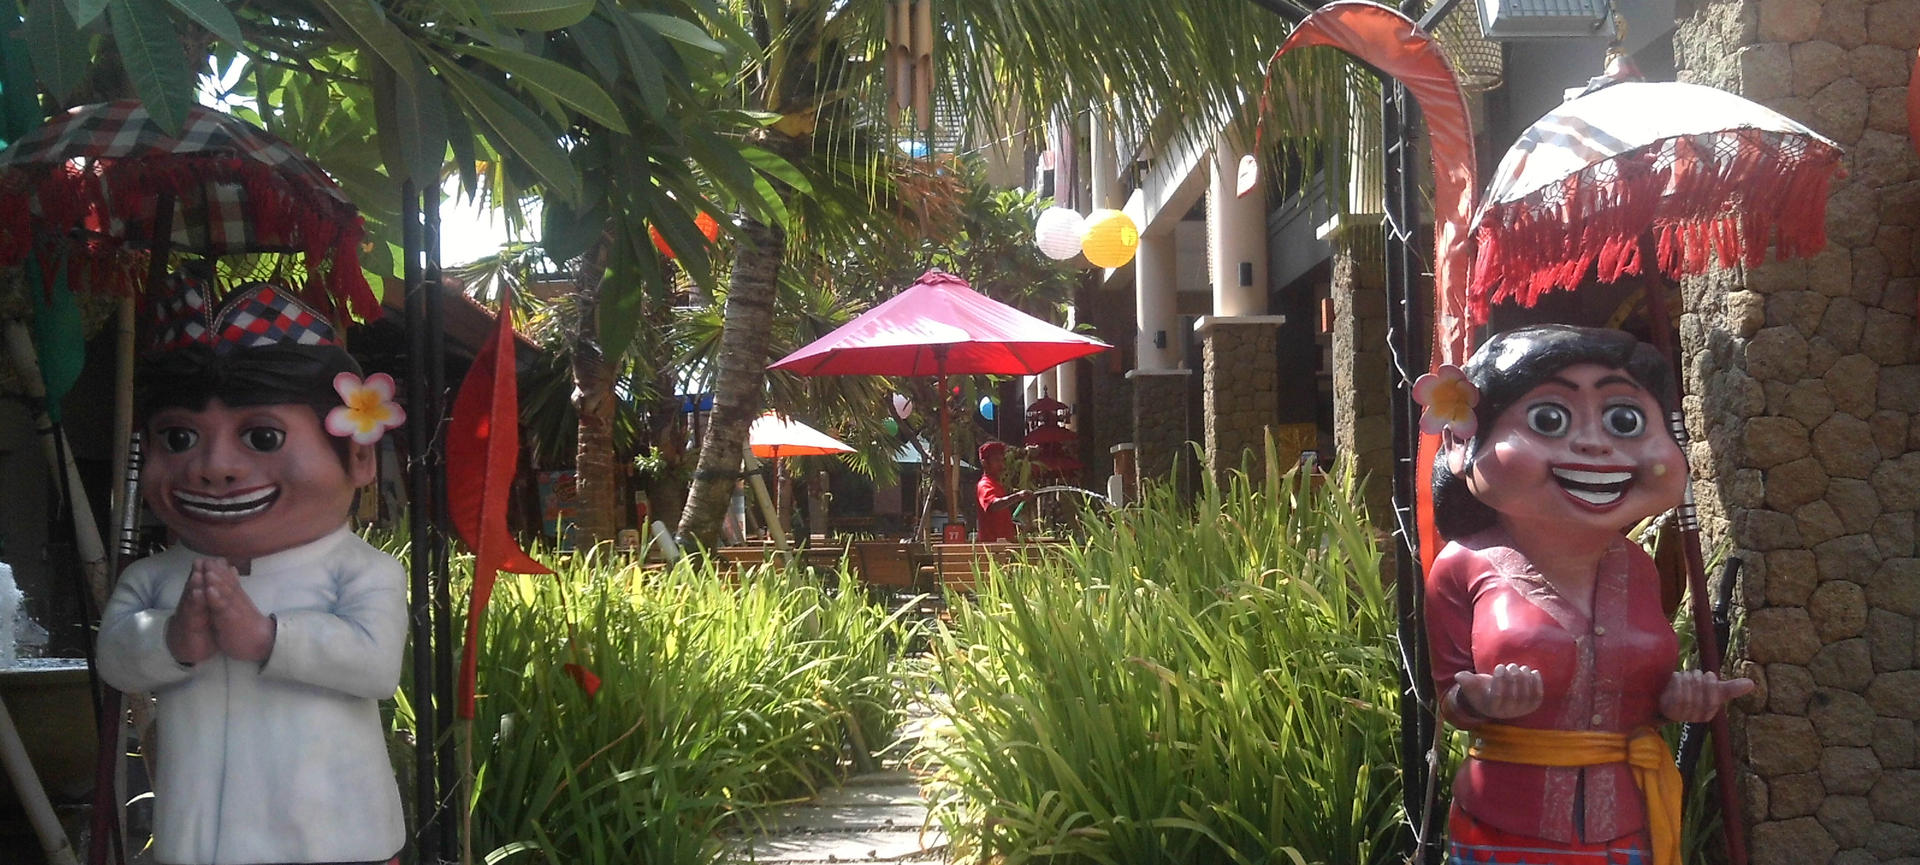 Jebak: Affordable Food Court In Downtown Denpasar, Bali